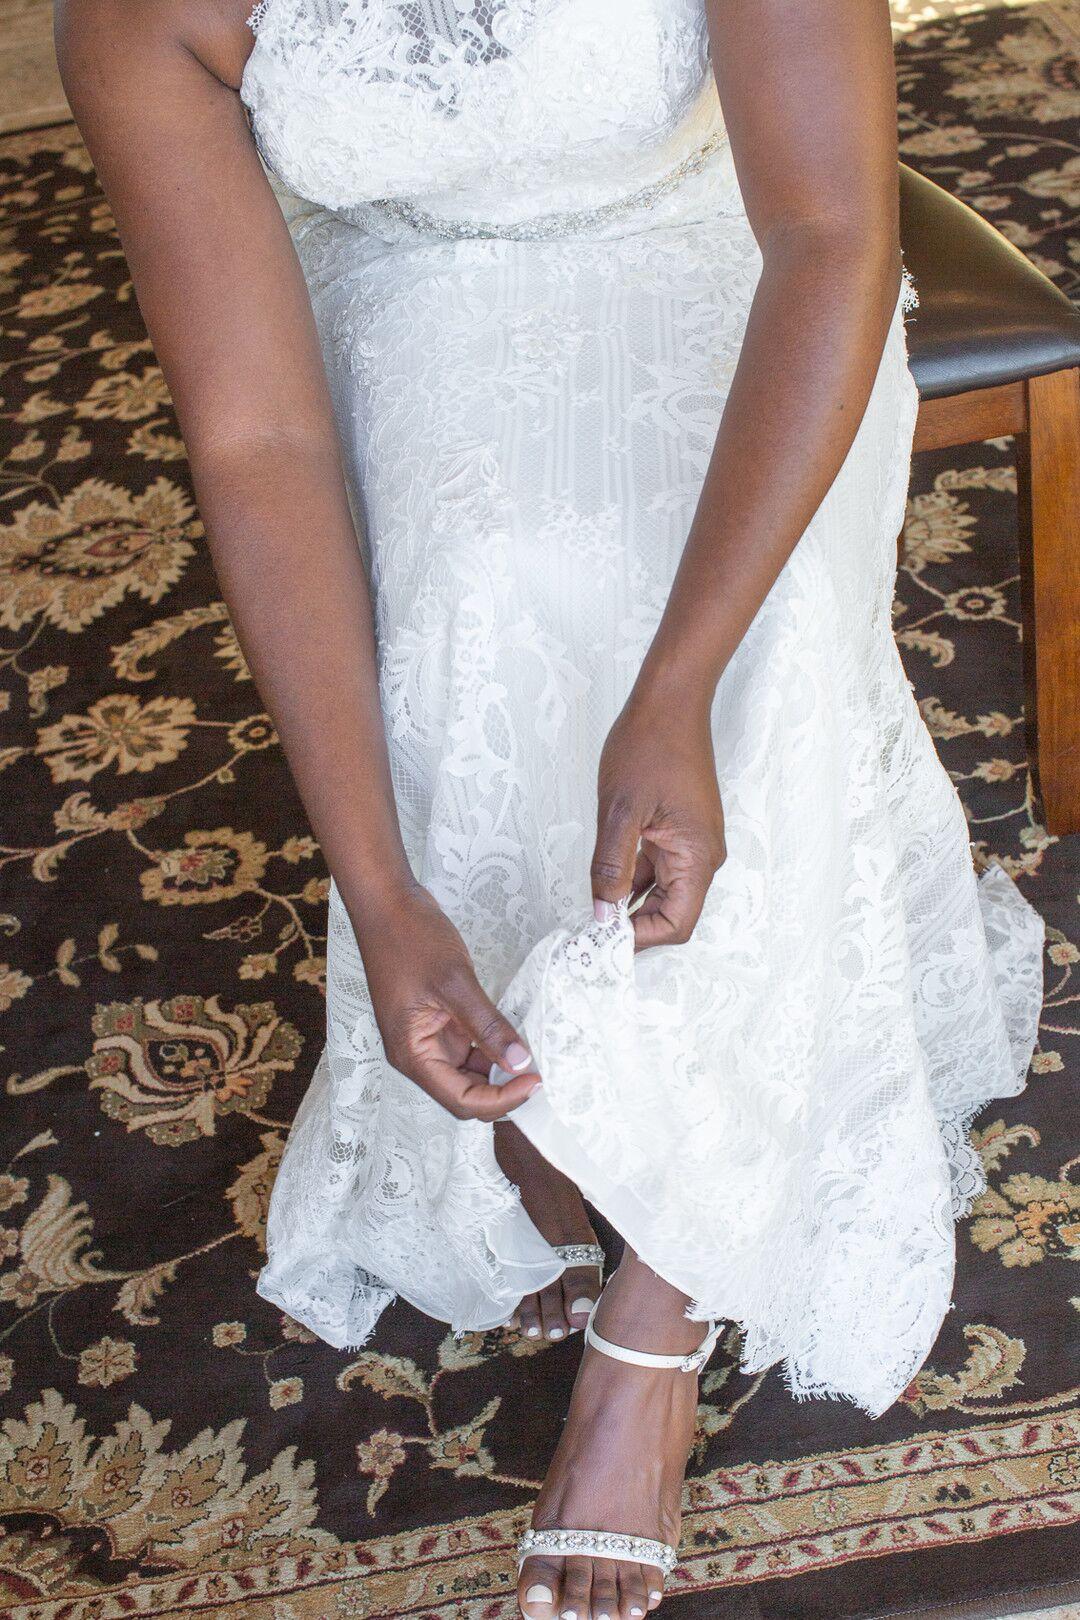 www.santabarbarawedding.com | Venue: The Casitas of Arroyo Grande | Photographer: Renoda Campbell Photography | Second Shooter: John Patrick Images |  Bride Adjusting Shoes